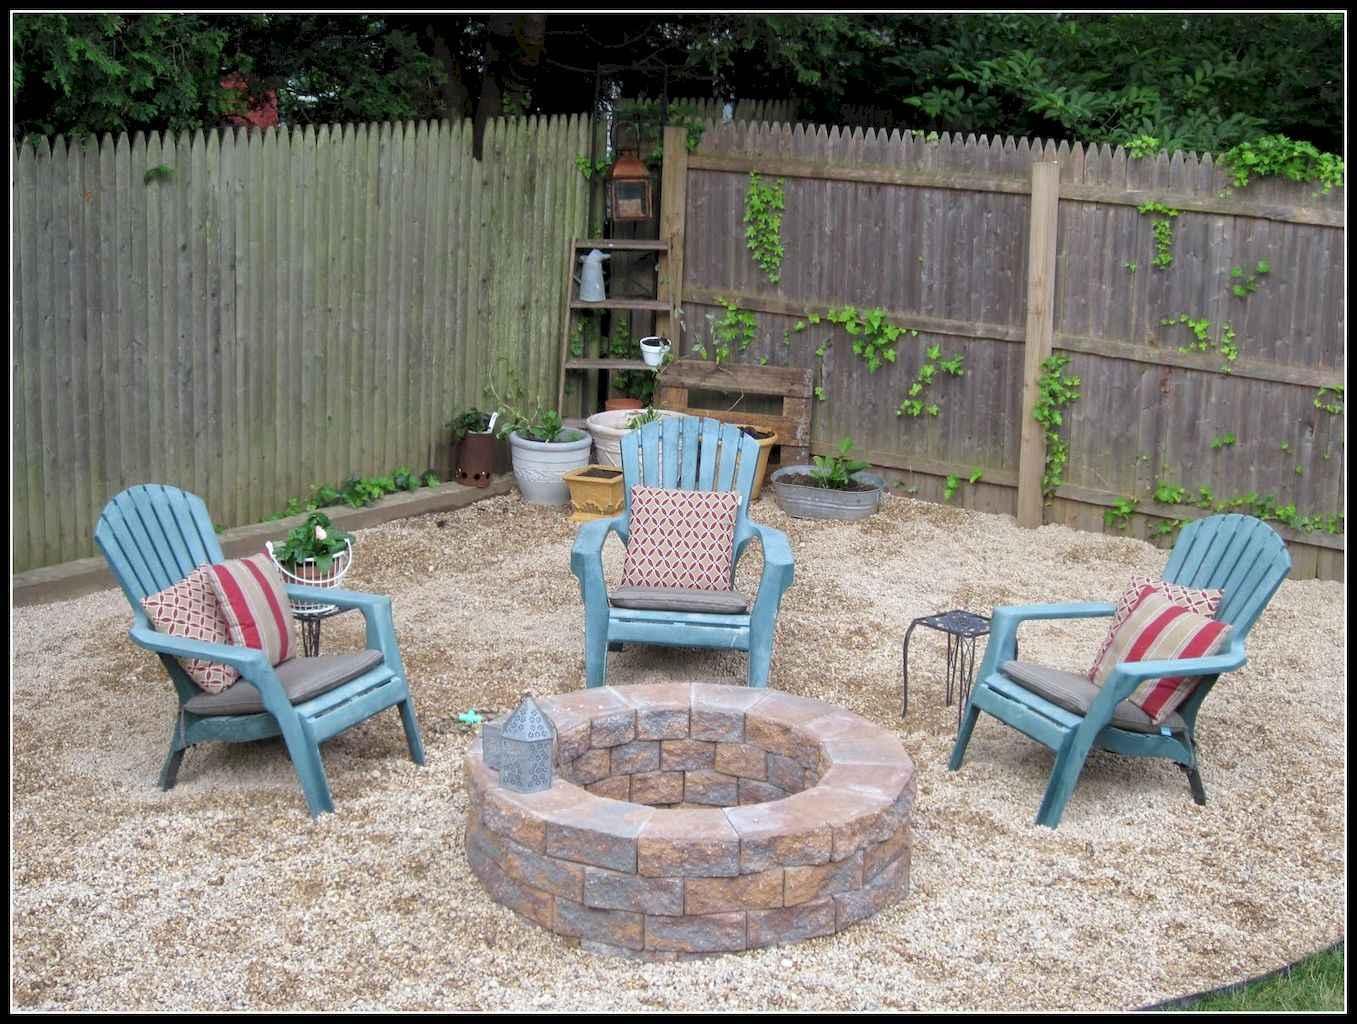 60 Beautiful Backyard Fire Pit Ideas Decoration and Remodel (24)